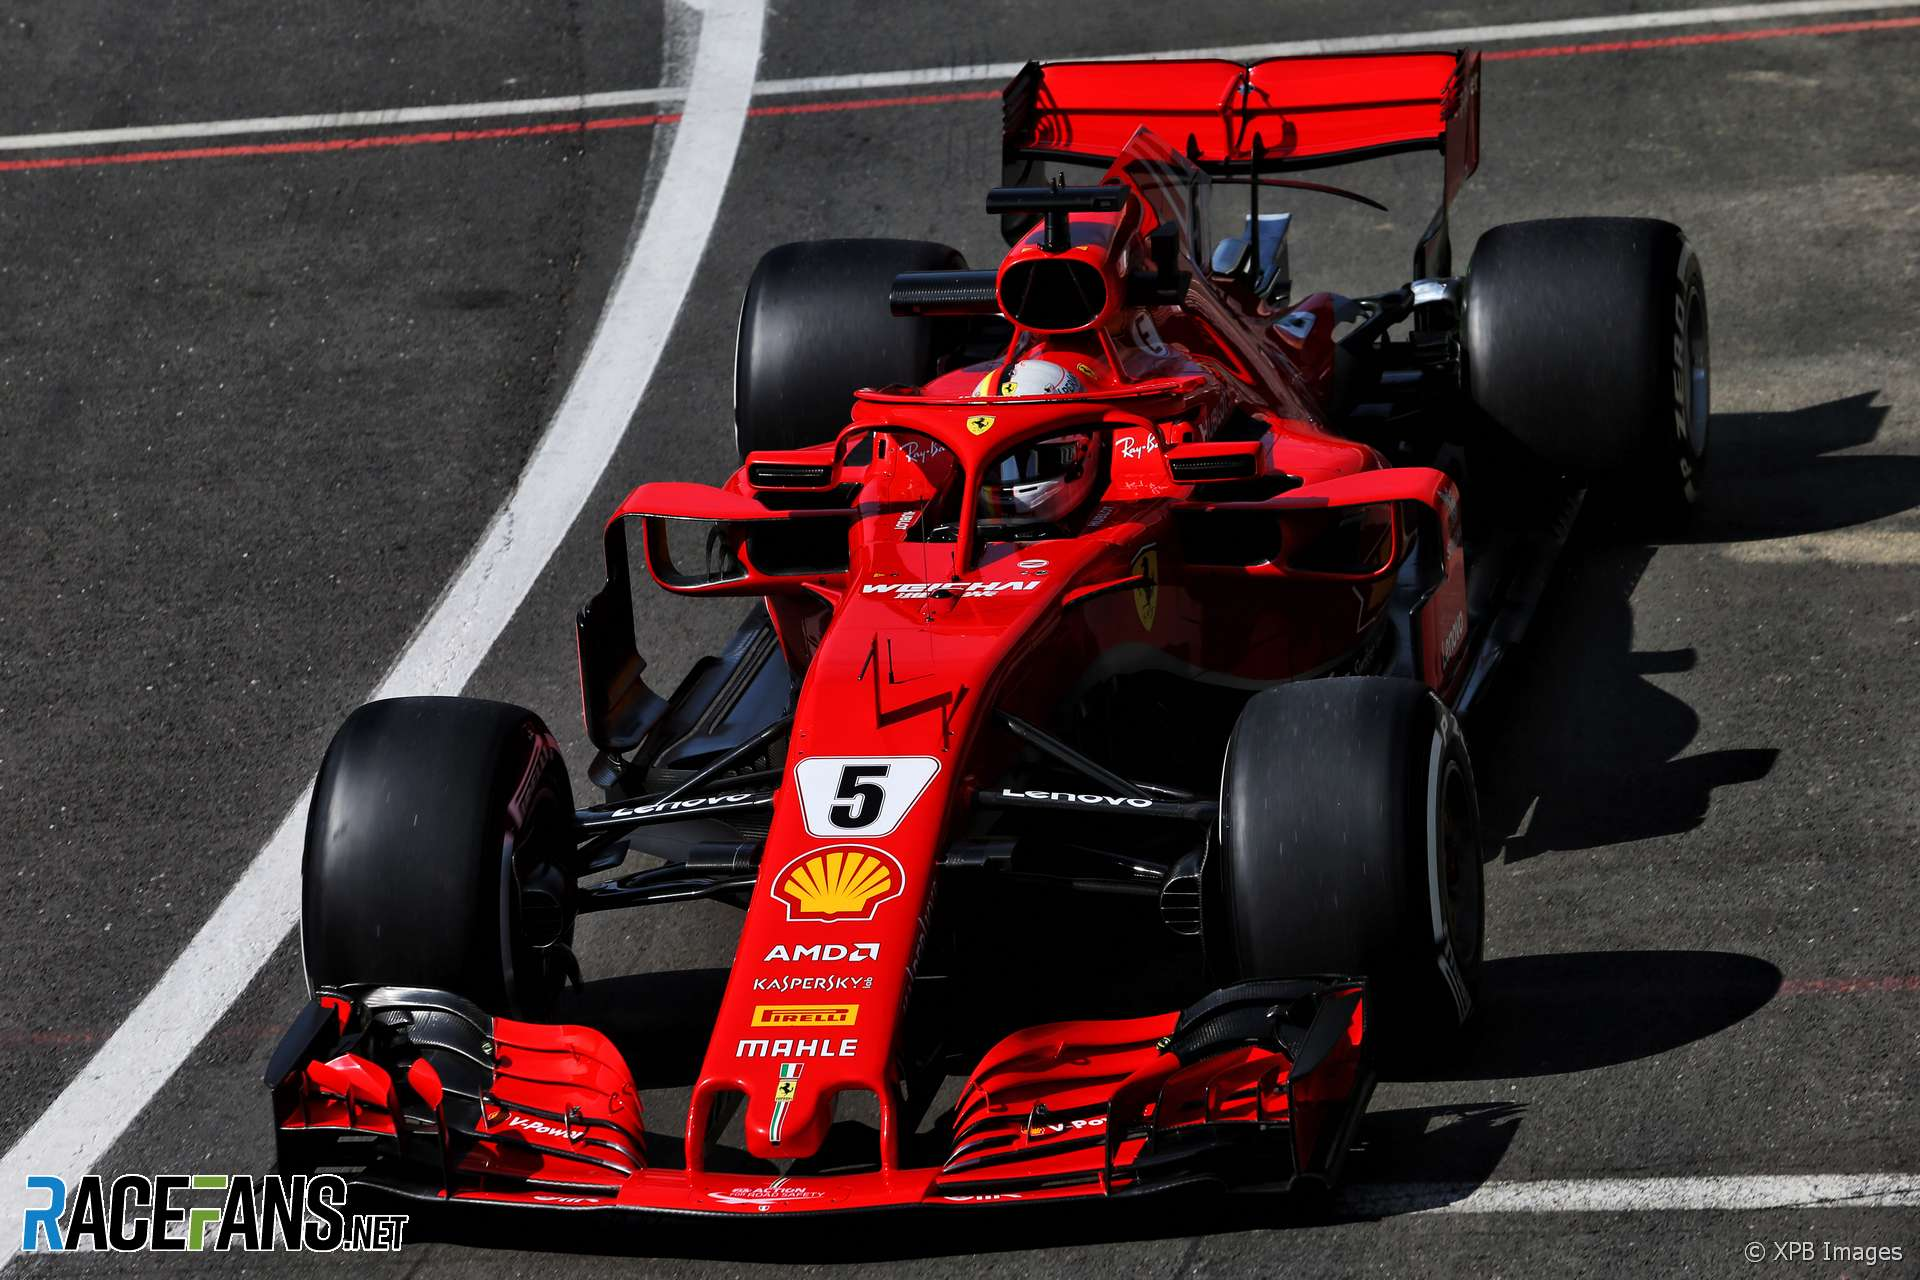 Sebastian Vettel, Ferrari, Silverstone, 2018